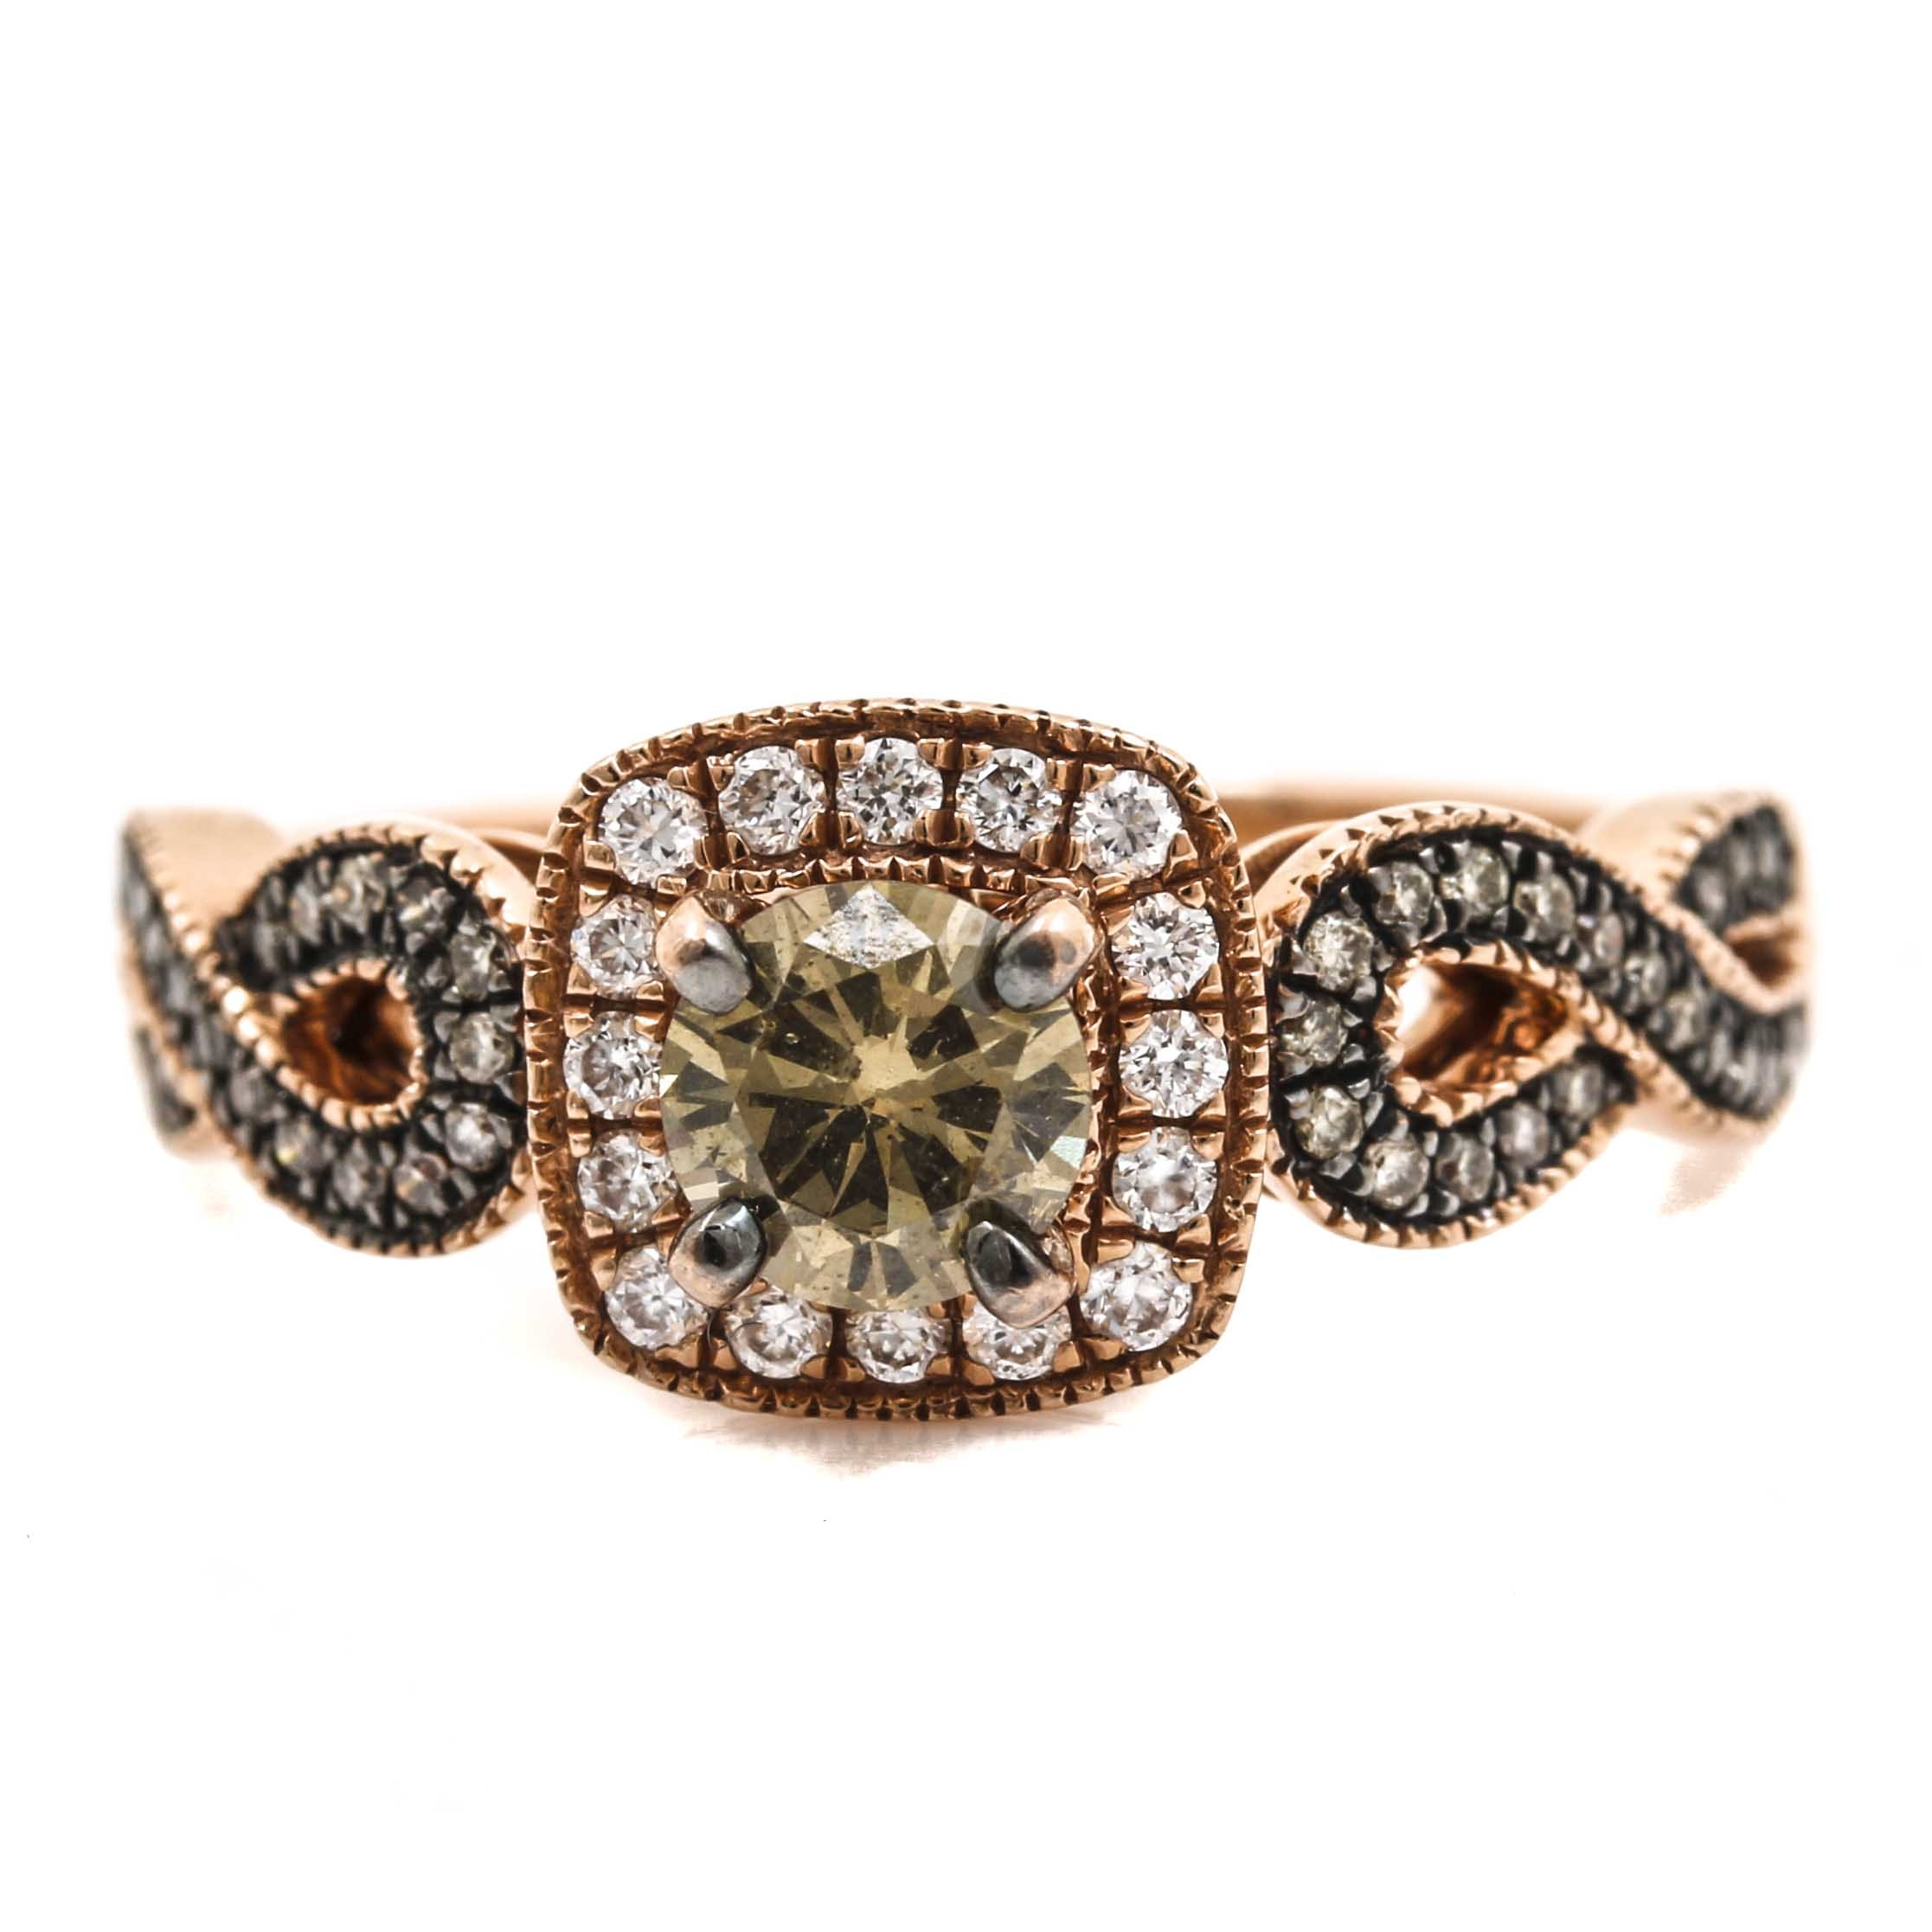 LeVian 14K Rose Gold Diamond Ring